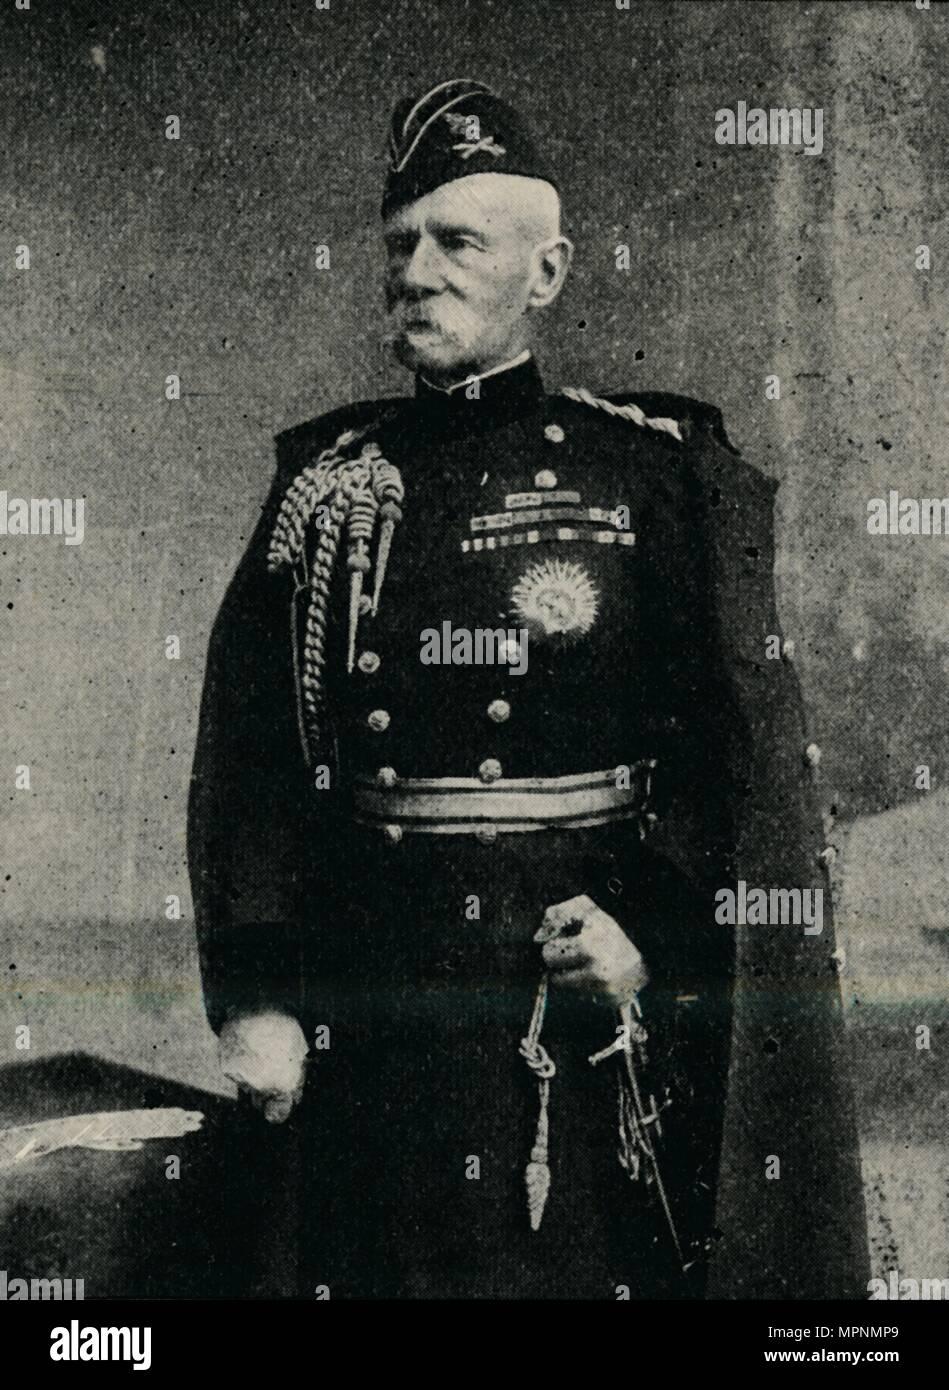 'Field-Marshal Lord Roberts, K.P., V.C.', 1902. Artist: Robinson & Sons. - Stock Image